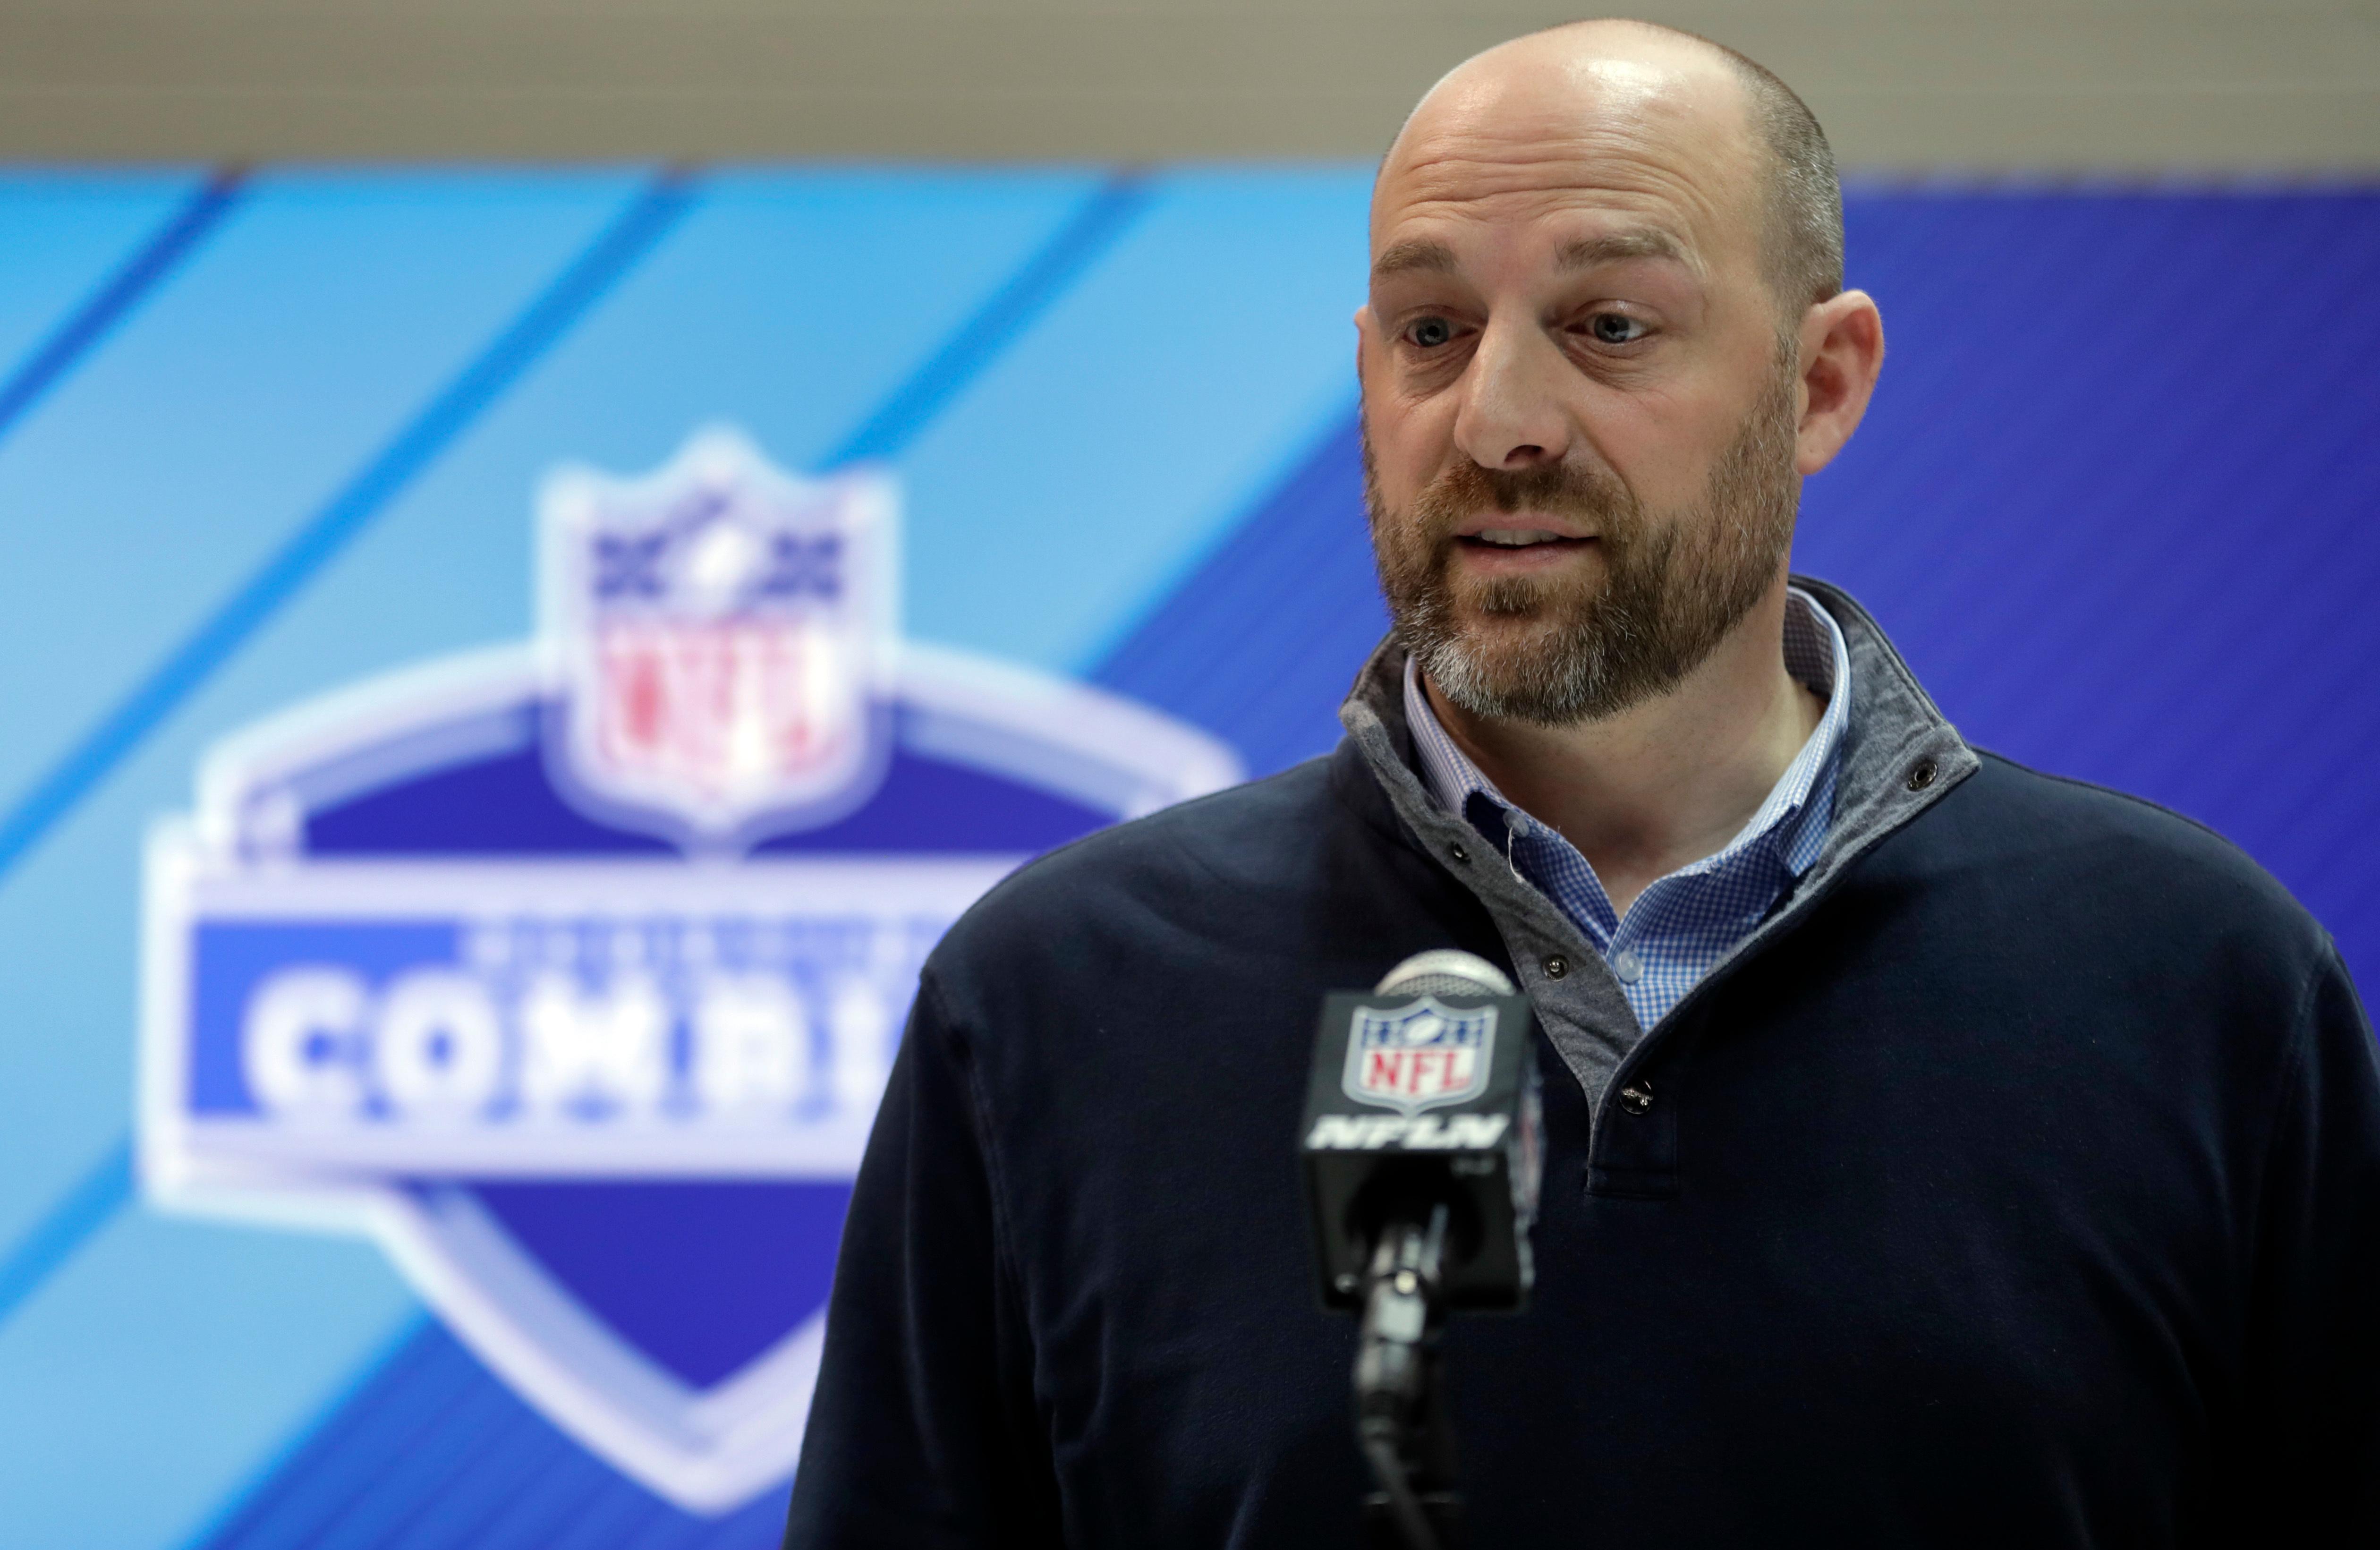 Bears coach Matt Nagy speaks during last year's NFL Combine.